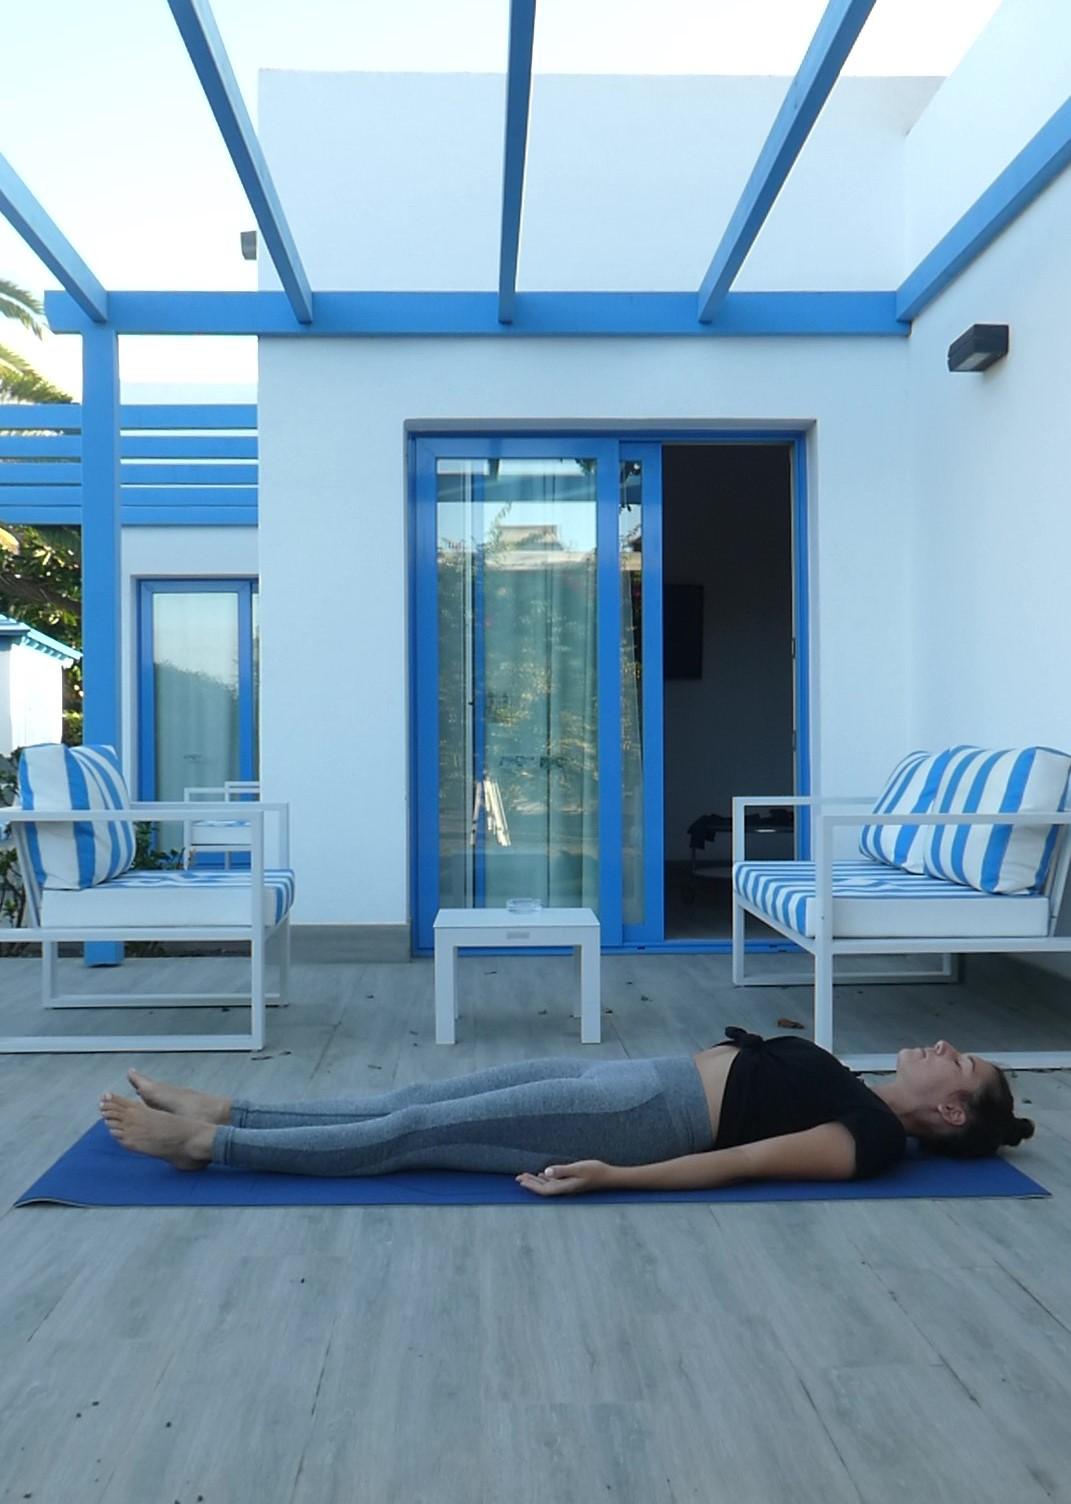 Posture du cadavre, Shavasana, yoga